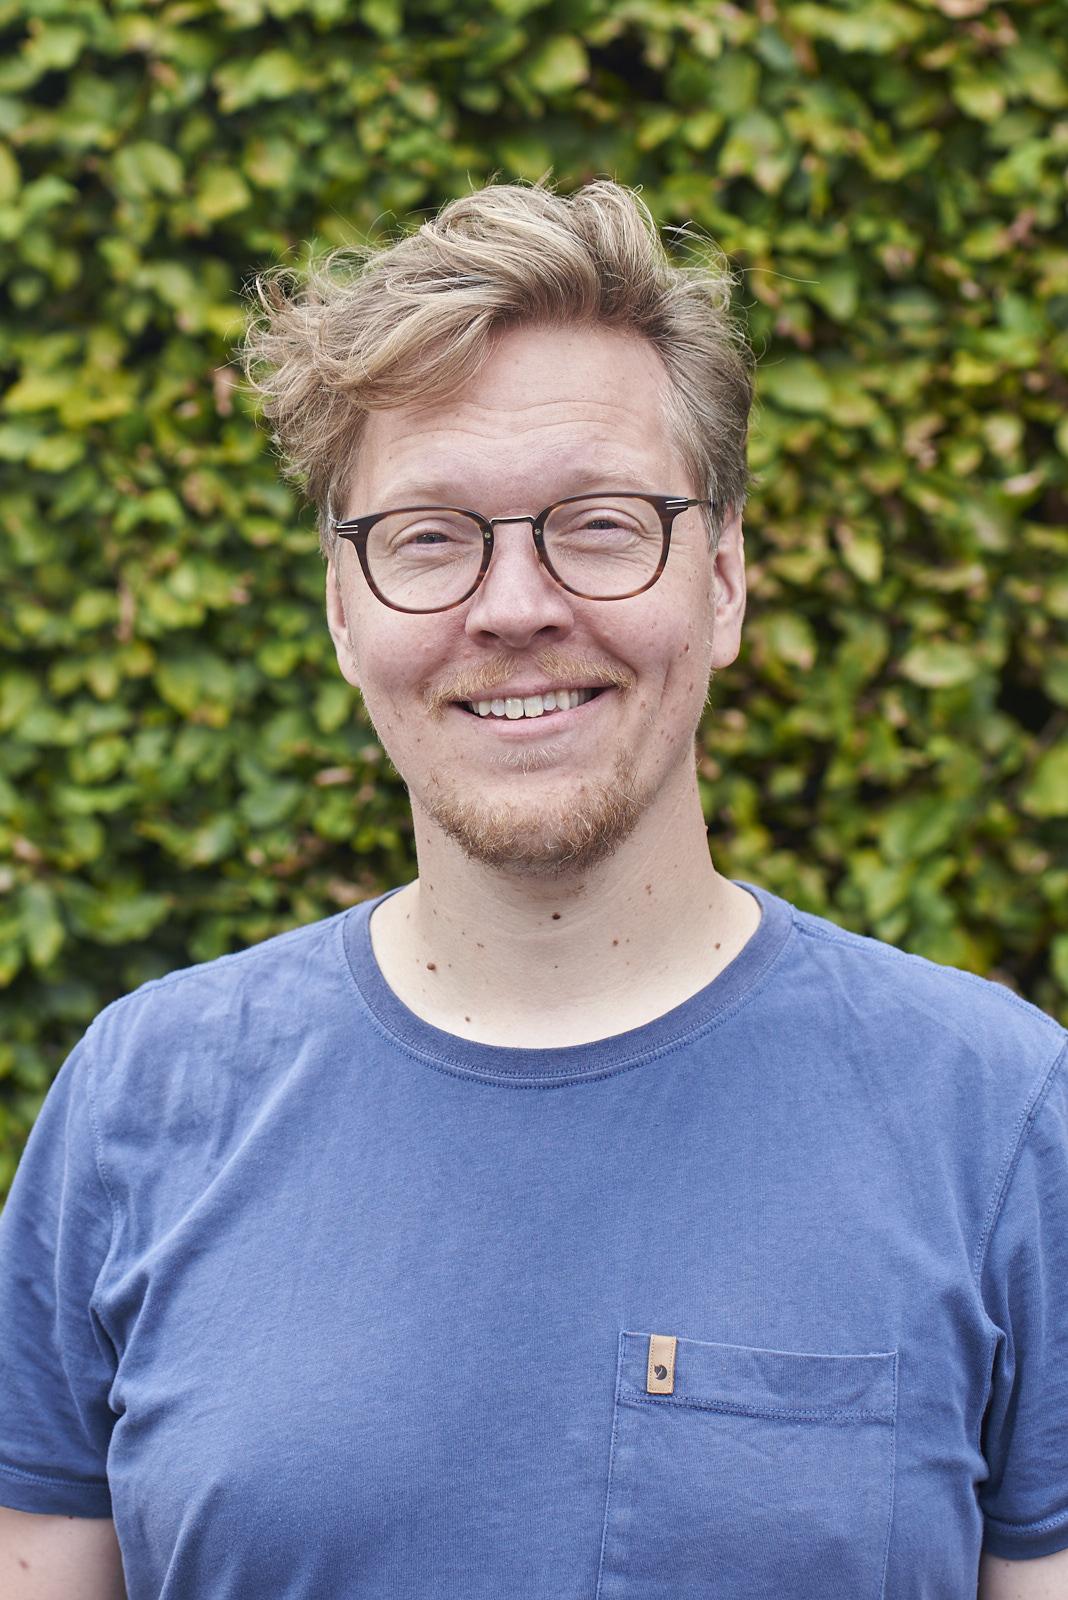 Nicky Schou Olsen